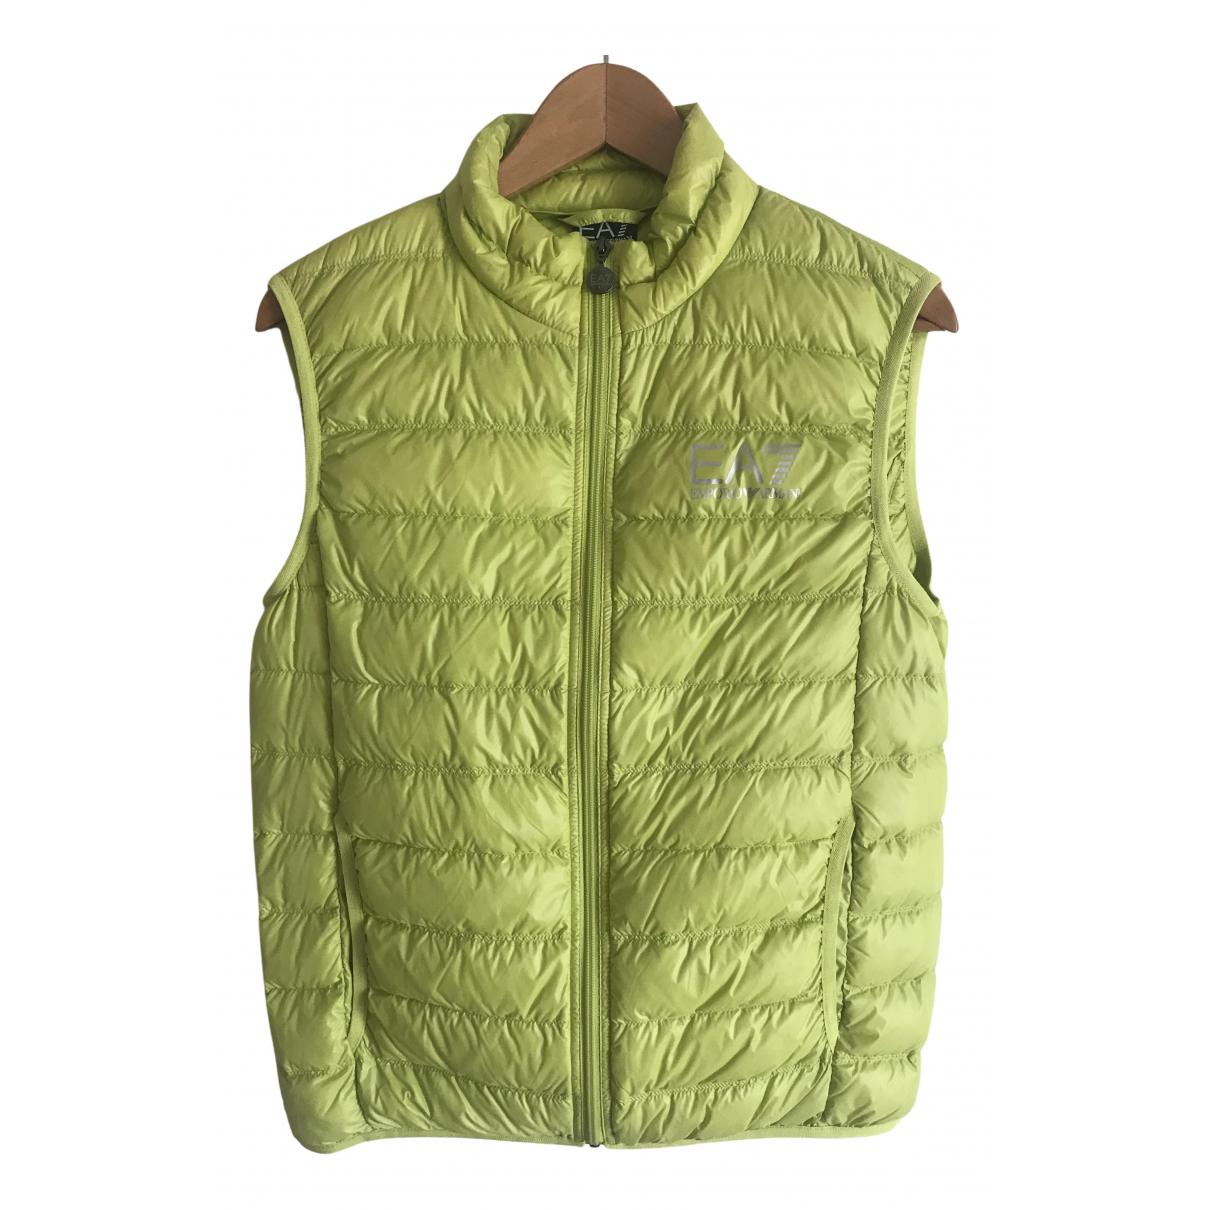 Emporio Armani \N Yellow coat  for Men M International